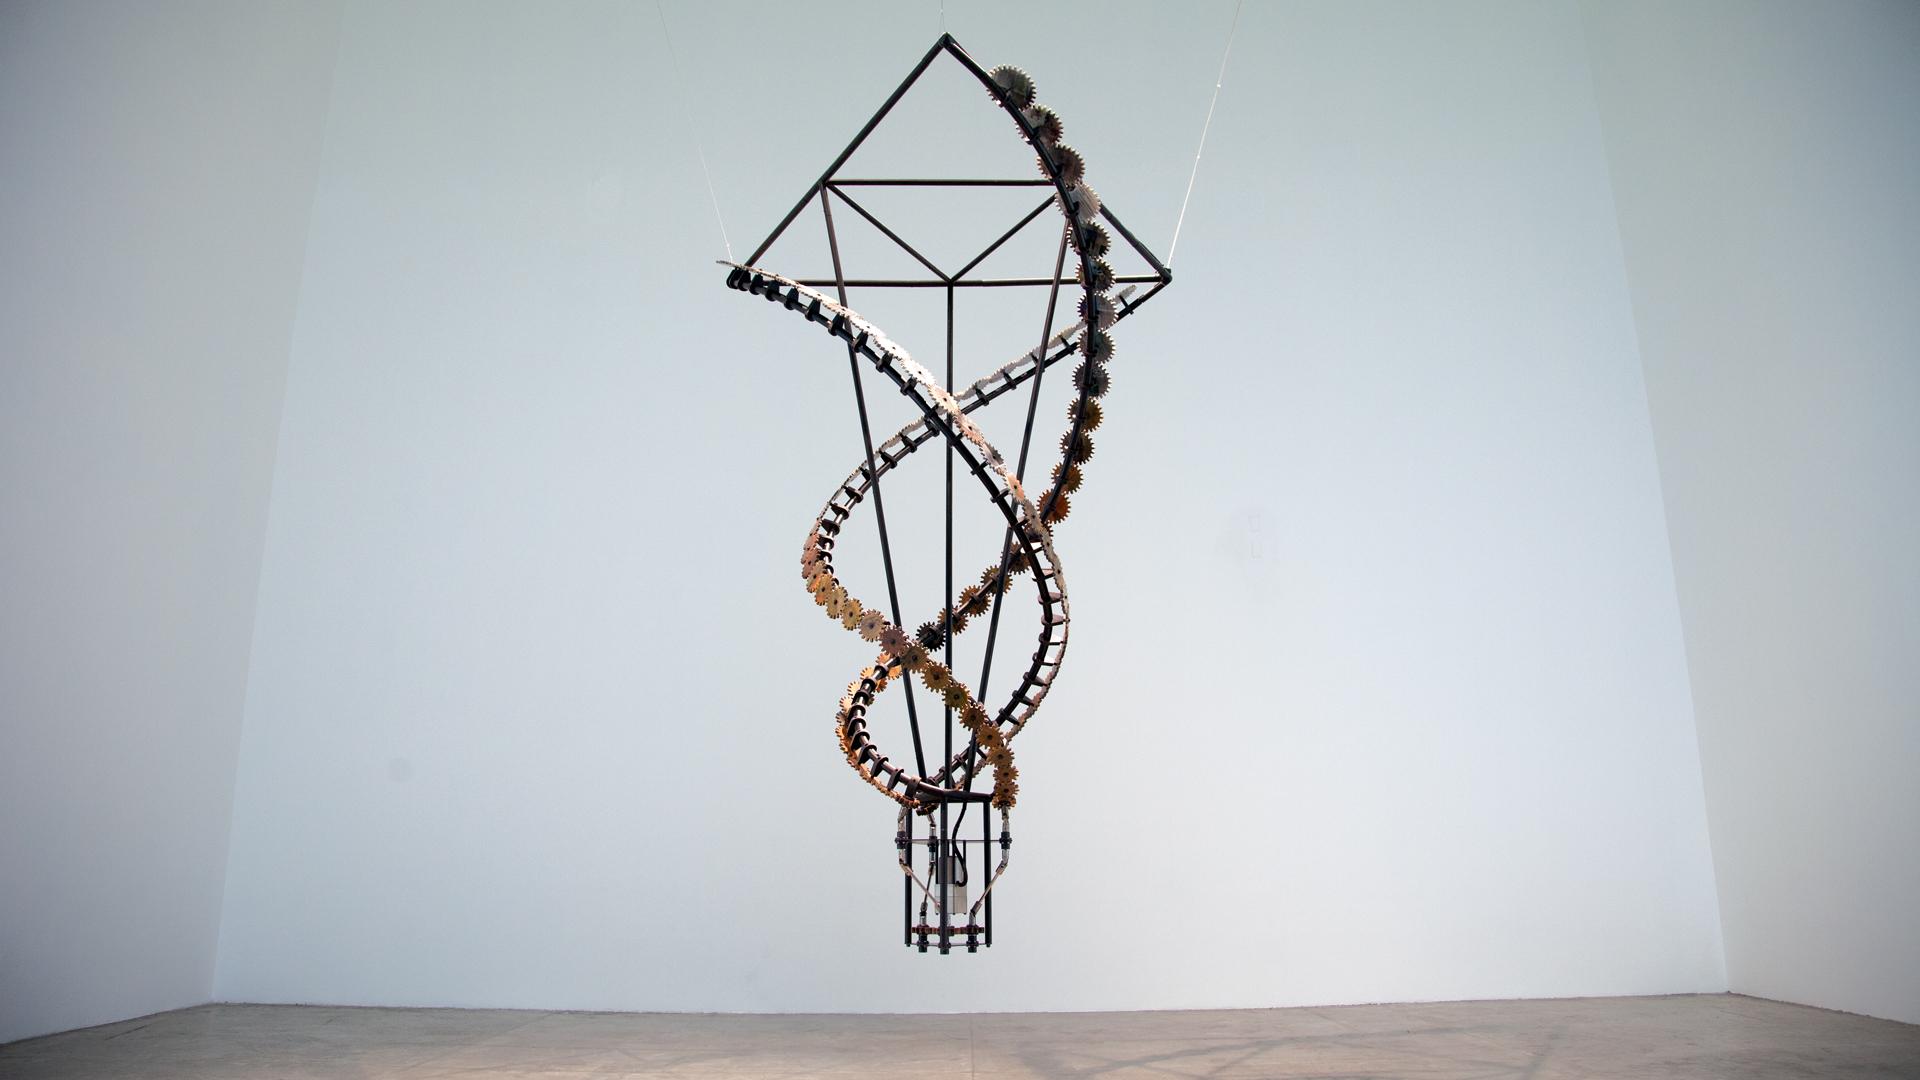 Marcela Armas (Mexico, b. 1976) Vórtice/Vortex , 2013.Image courtesy of the artist